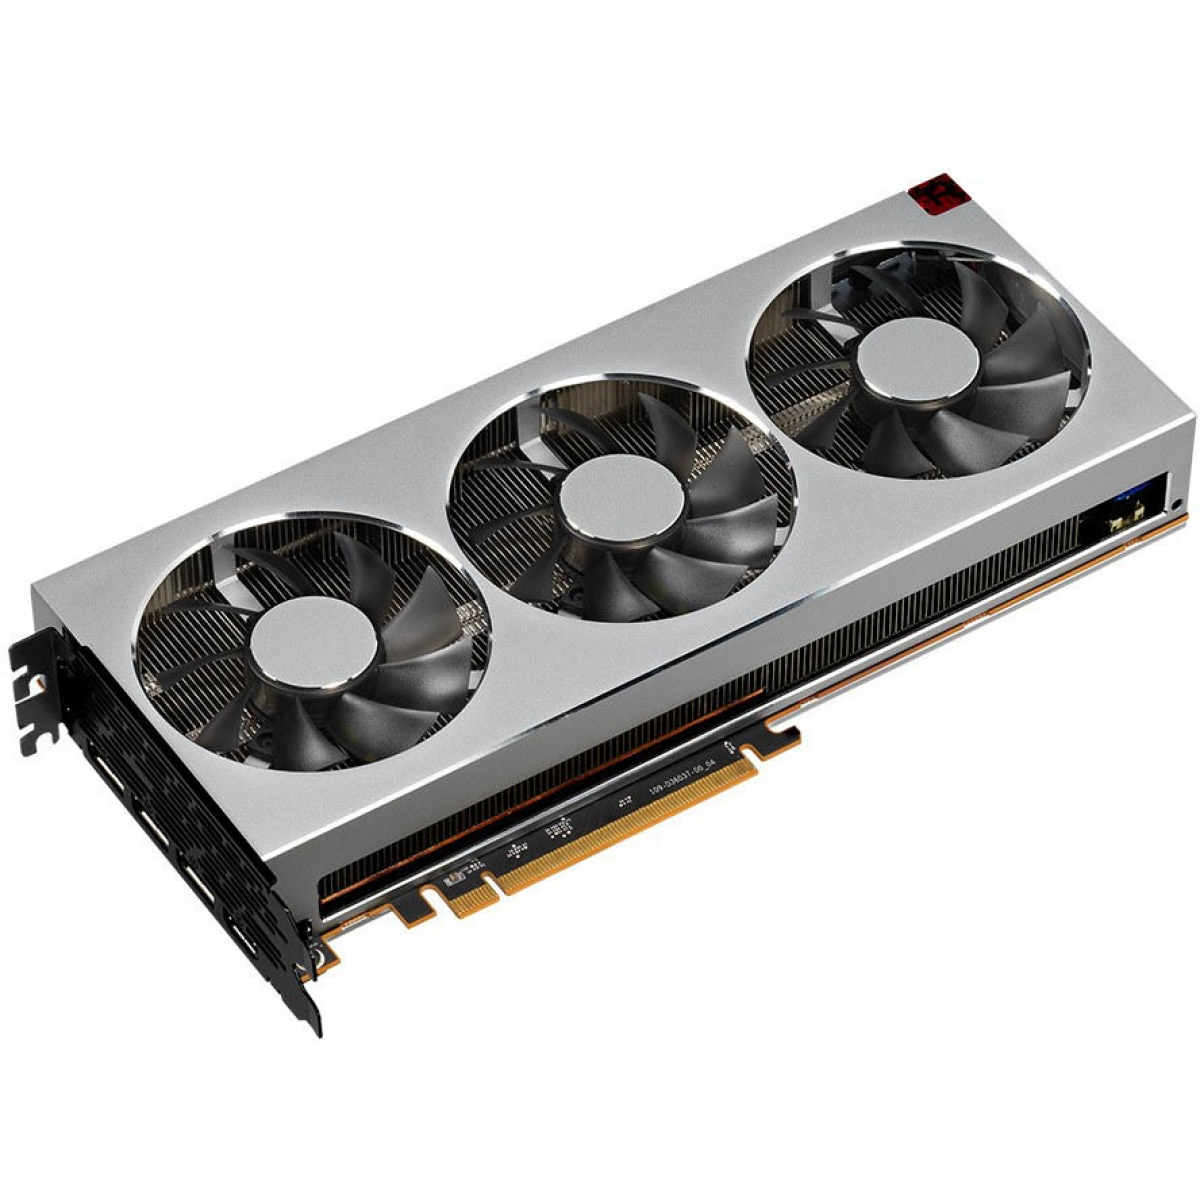 Placa de Vídeo Asus, Radeon VII, 16GB, HBM2, 4096Bit, 90YV0CY0-U0NA00